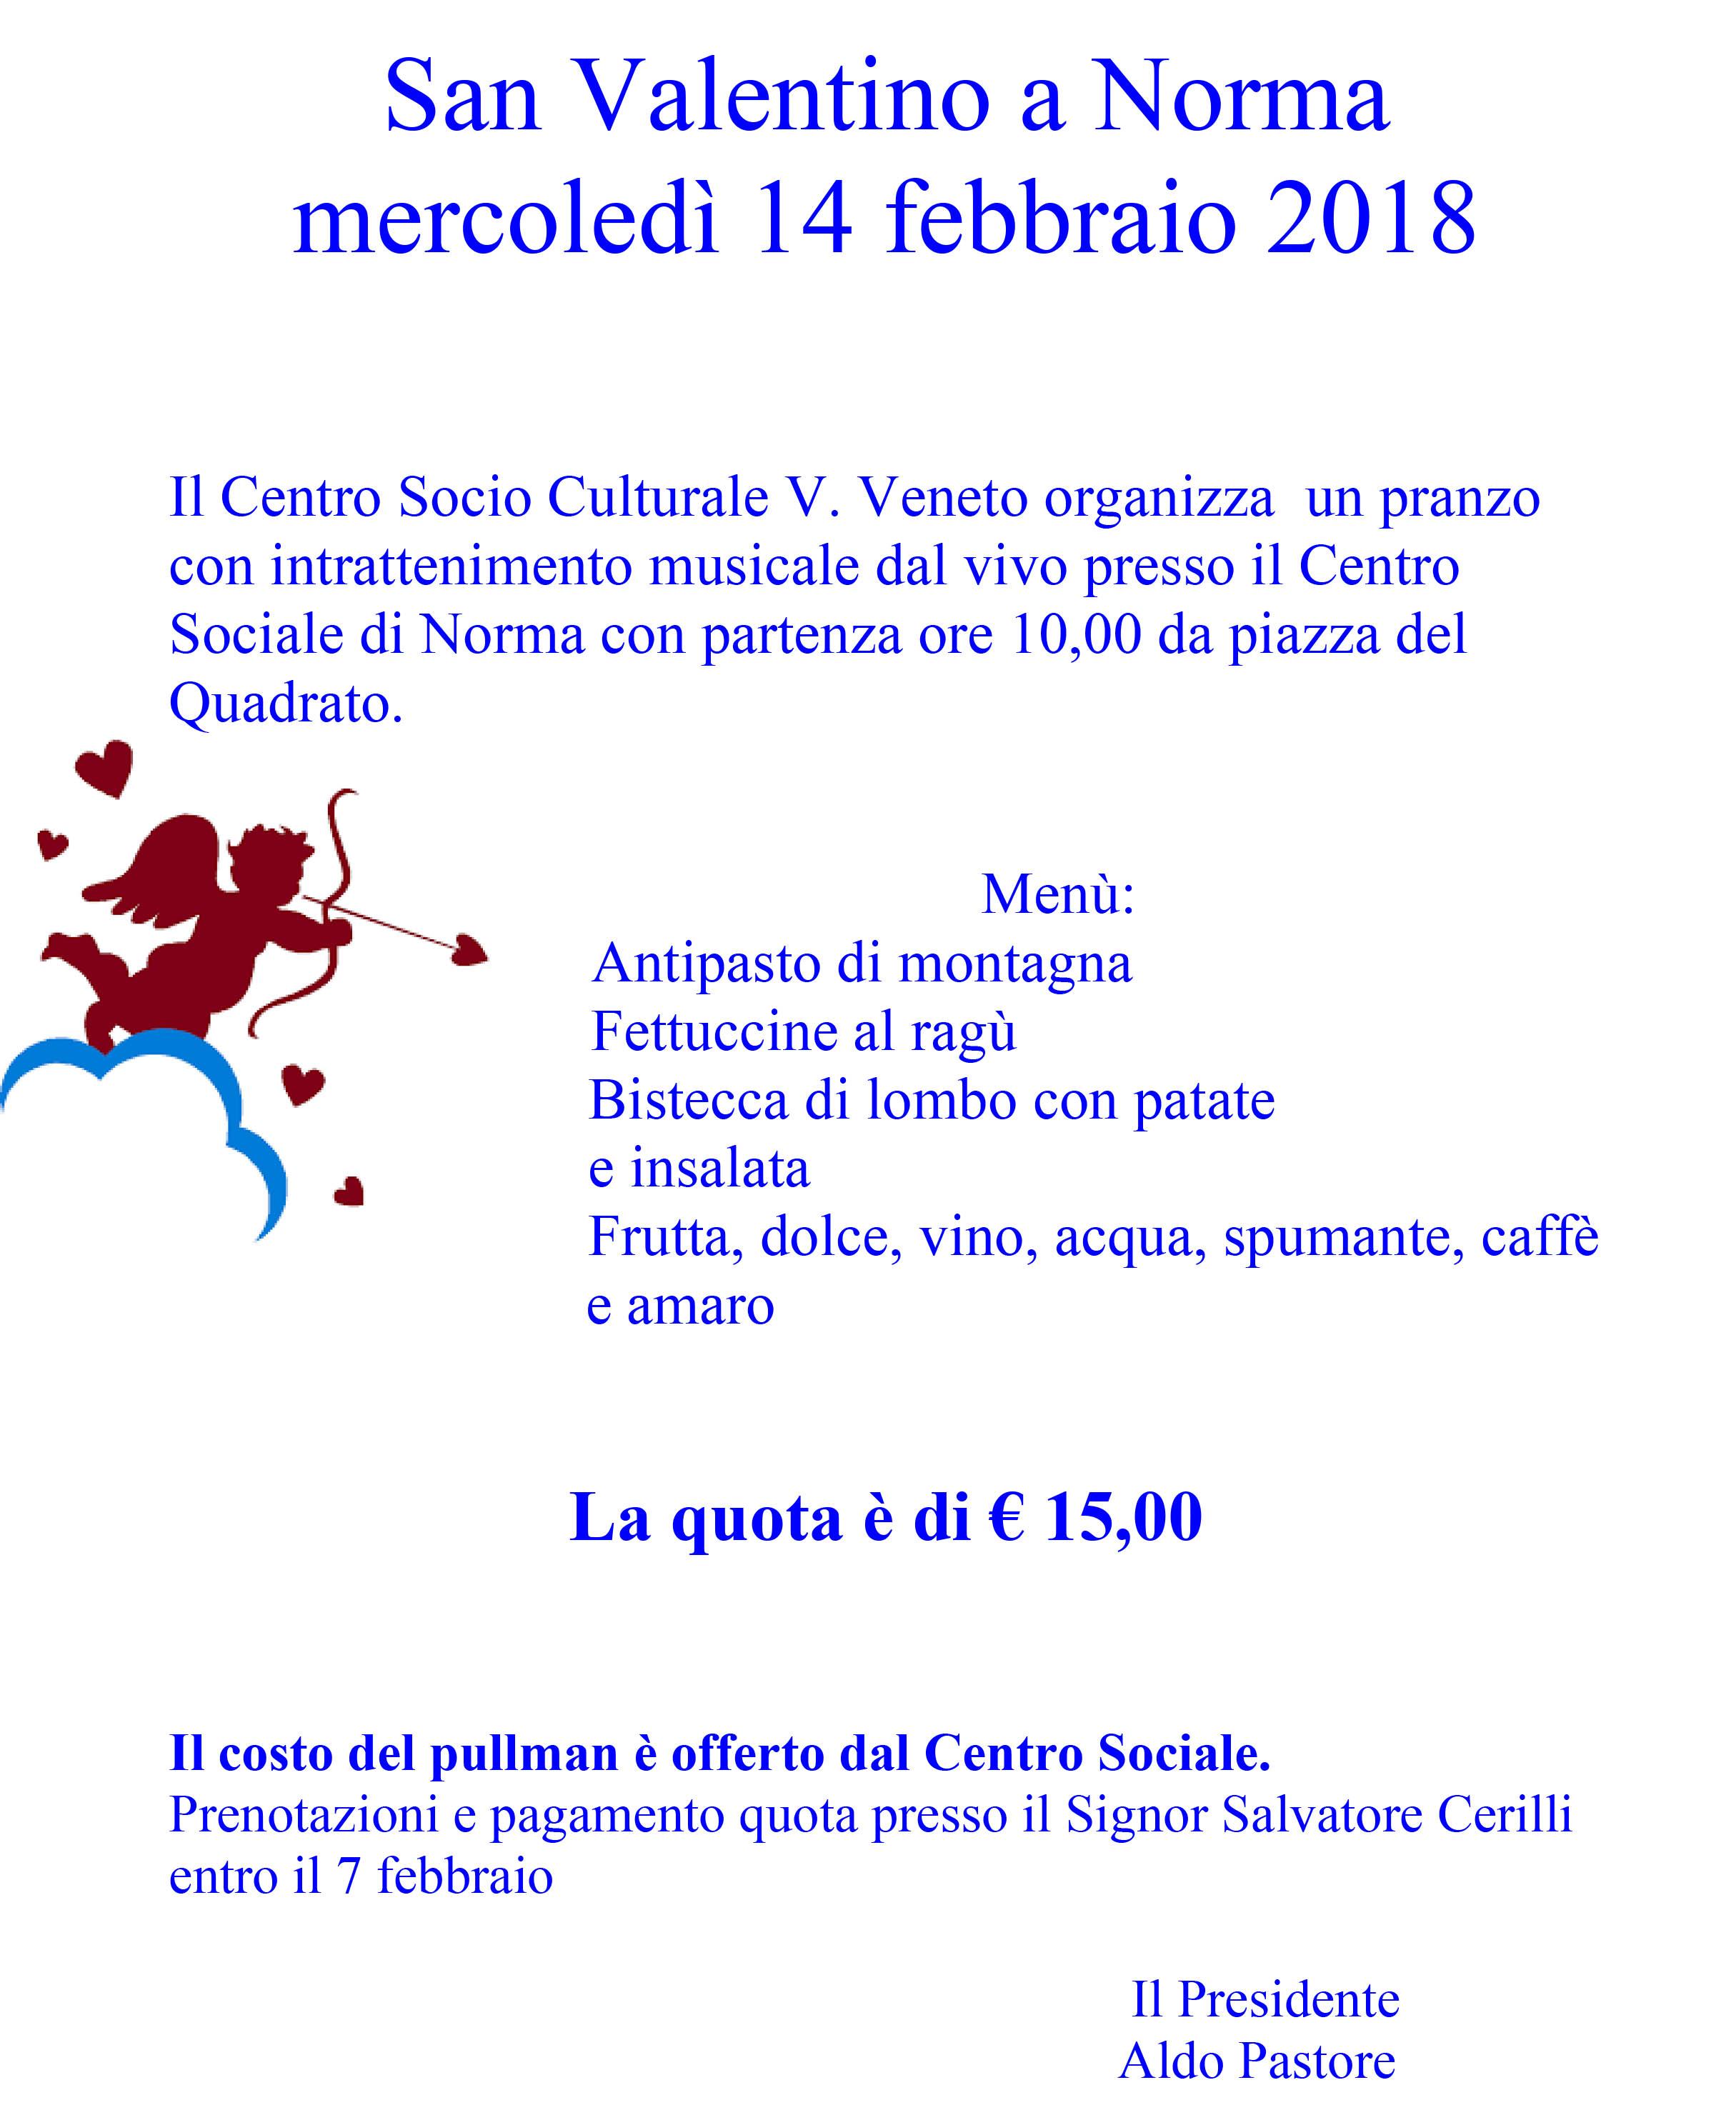 Microsoft Word - San Valentino a Norma mercoledì 14 febbraio 20